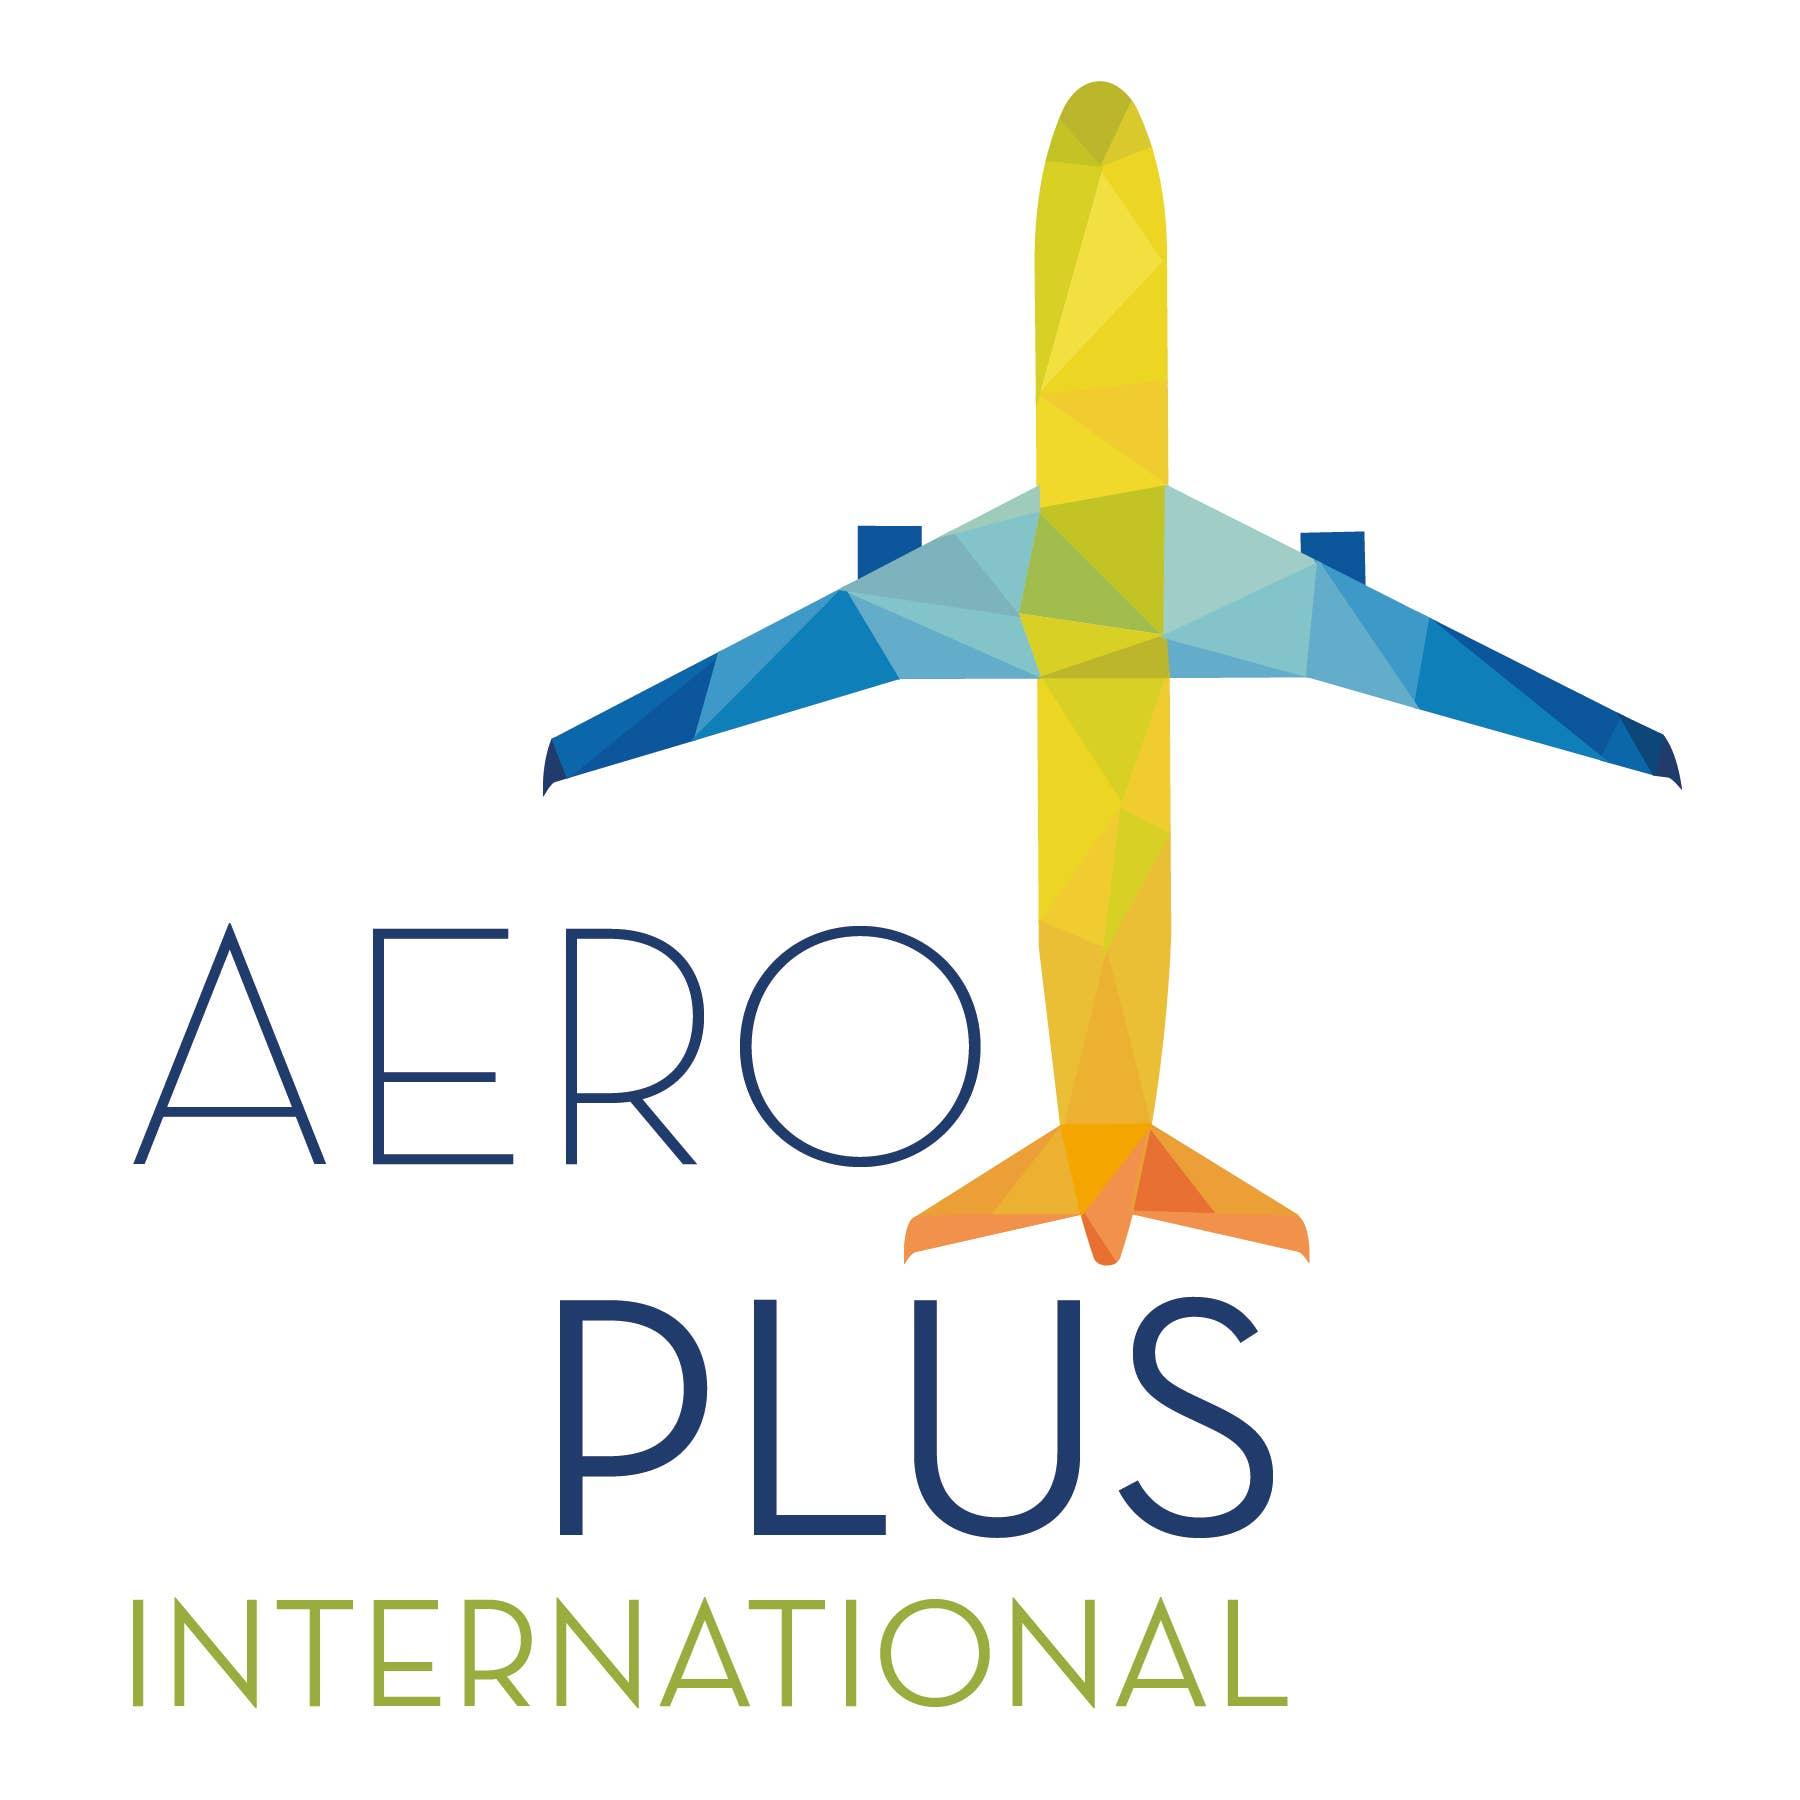 Logo of company AERO PLUS INTL HOLDINGS LTD